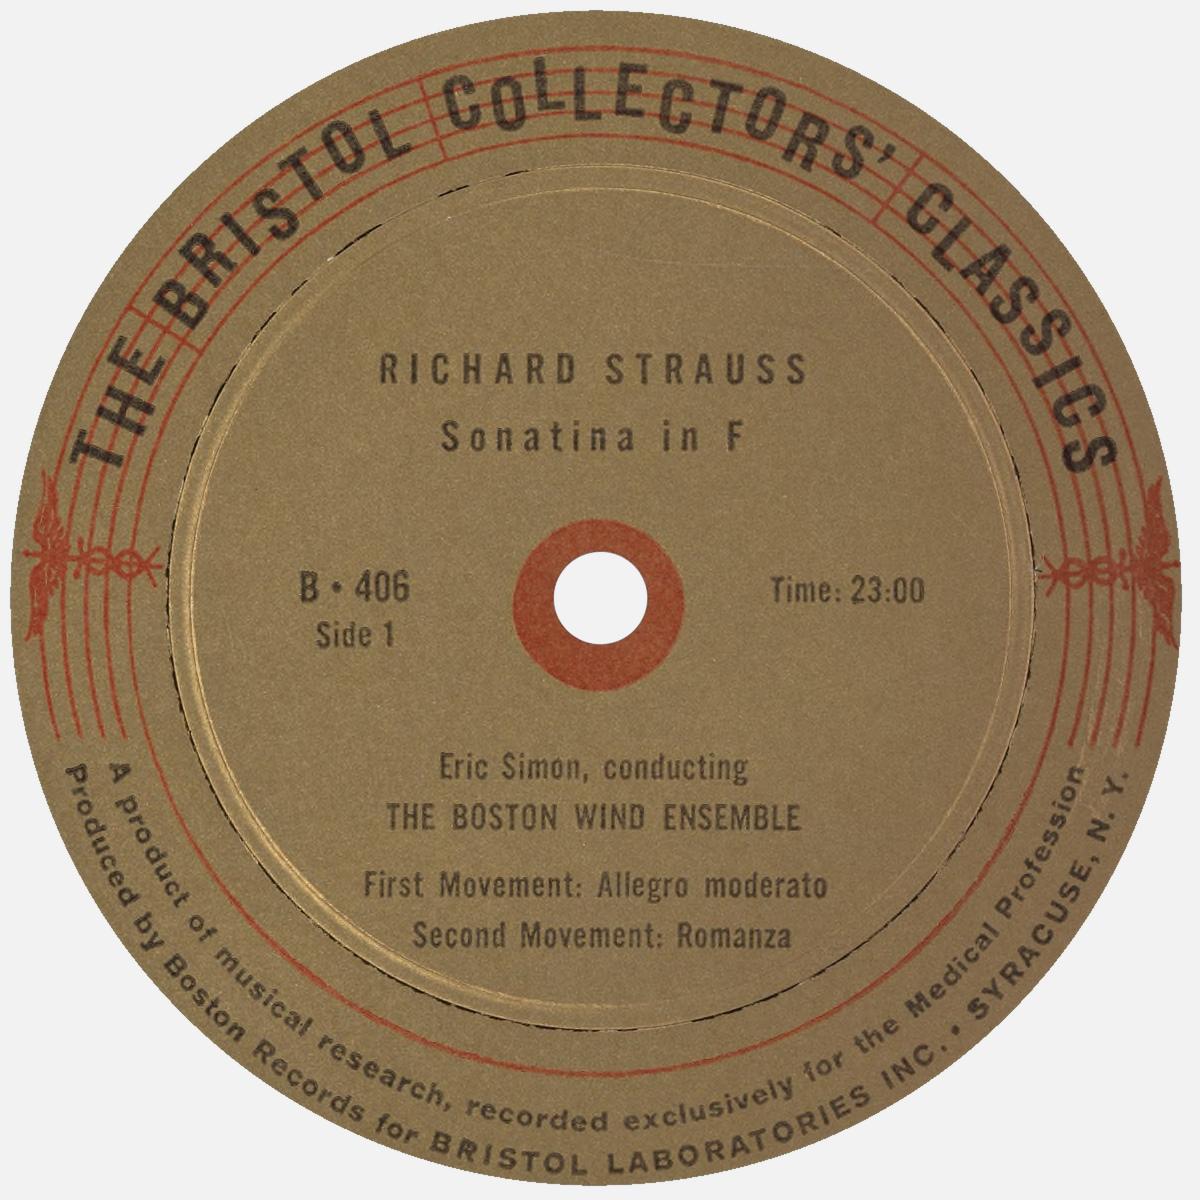 Recto du disque Boston Records B 406